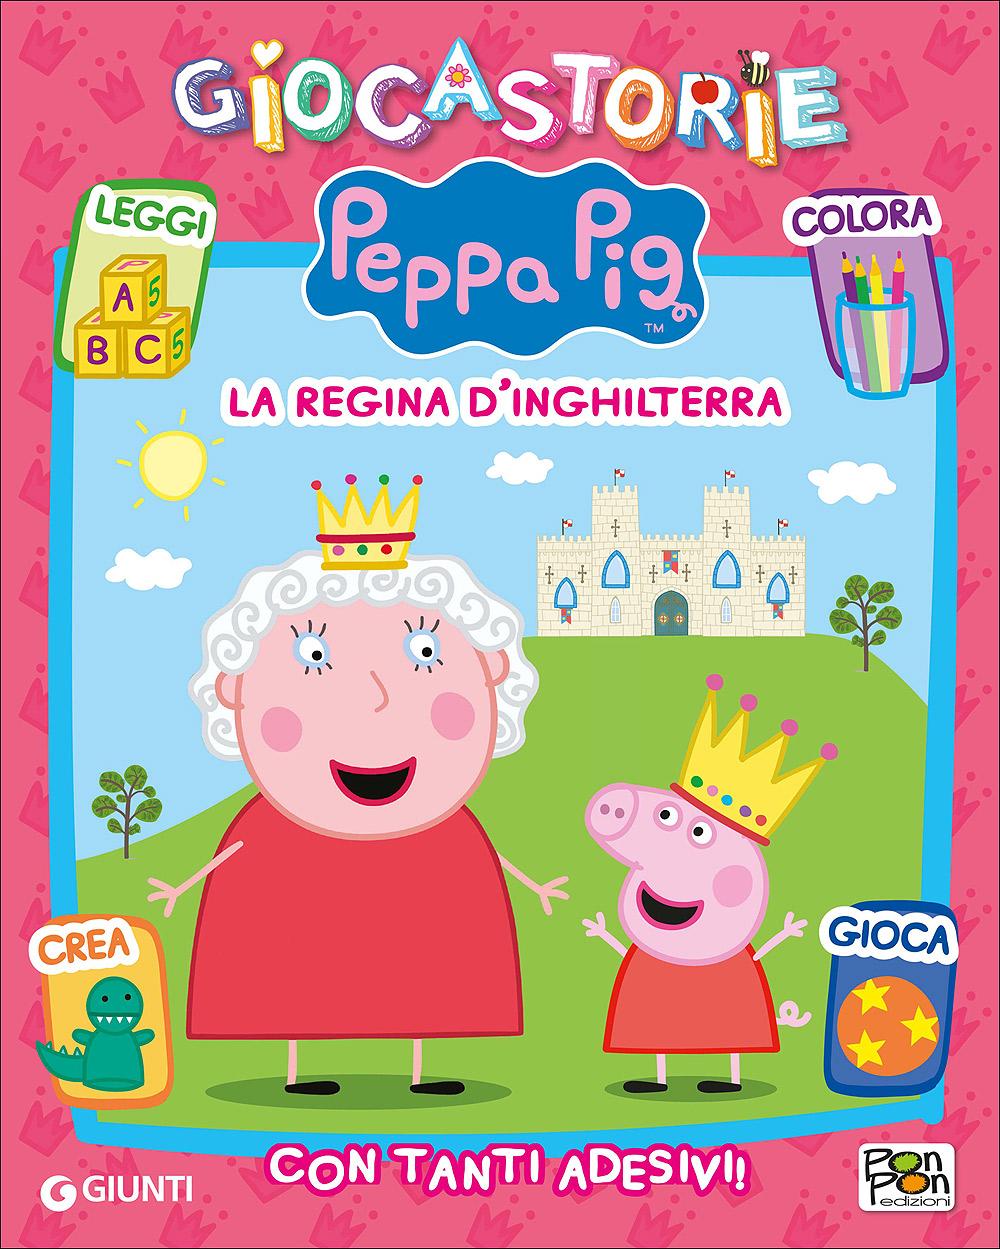 Giocastorie Peppa Pig - La regina d'Inghilterra